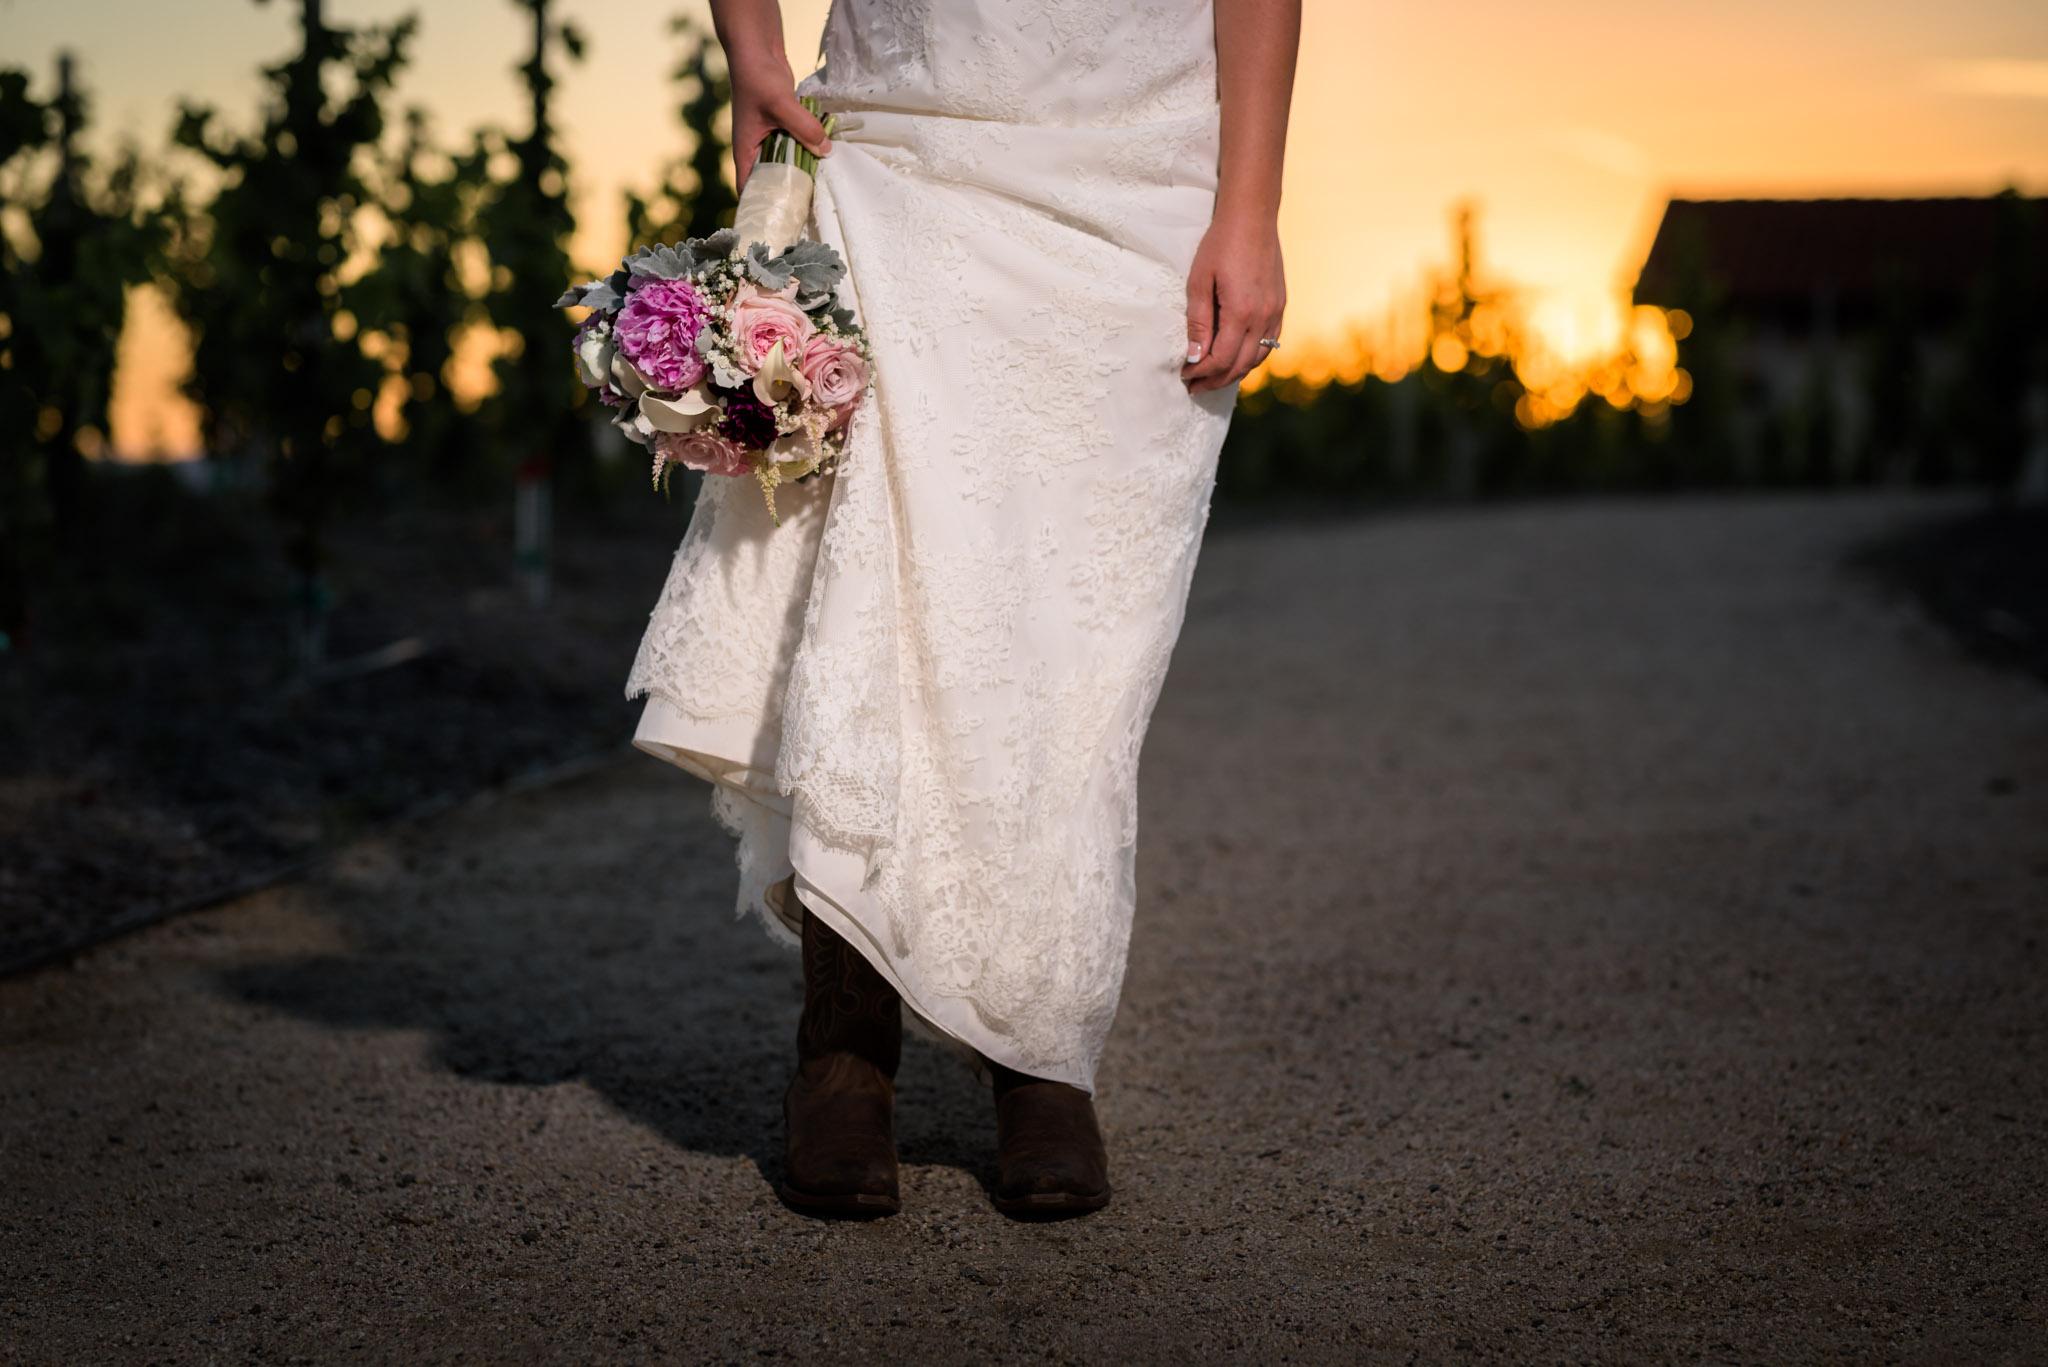 Avensole-Winery-Temecula-Wedding-Josh-and-Olivia-3827.JPG